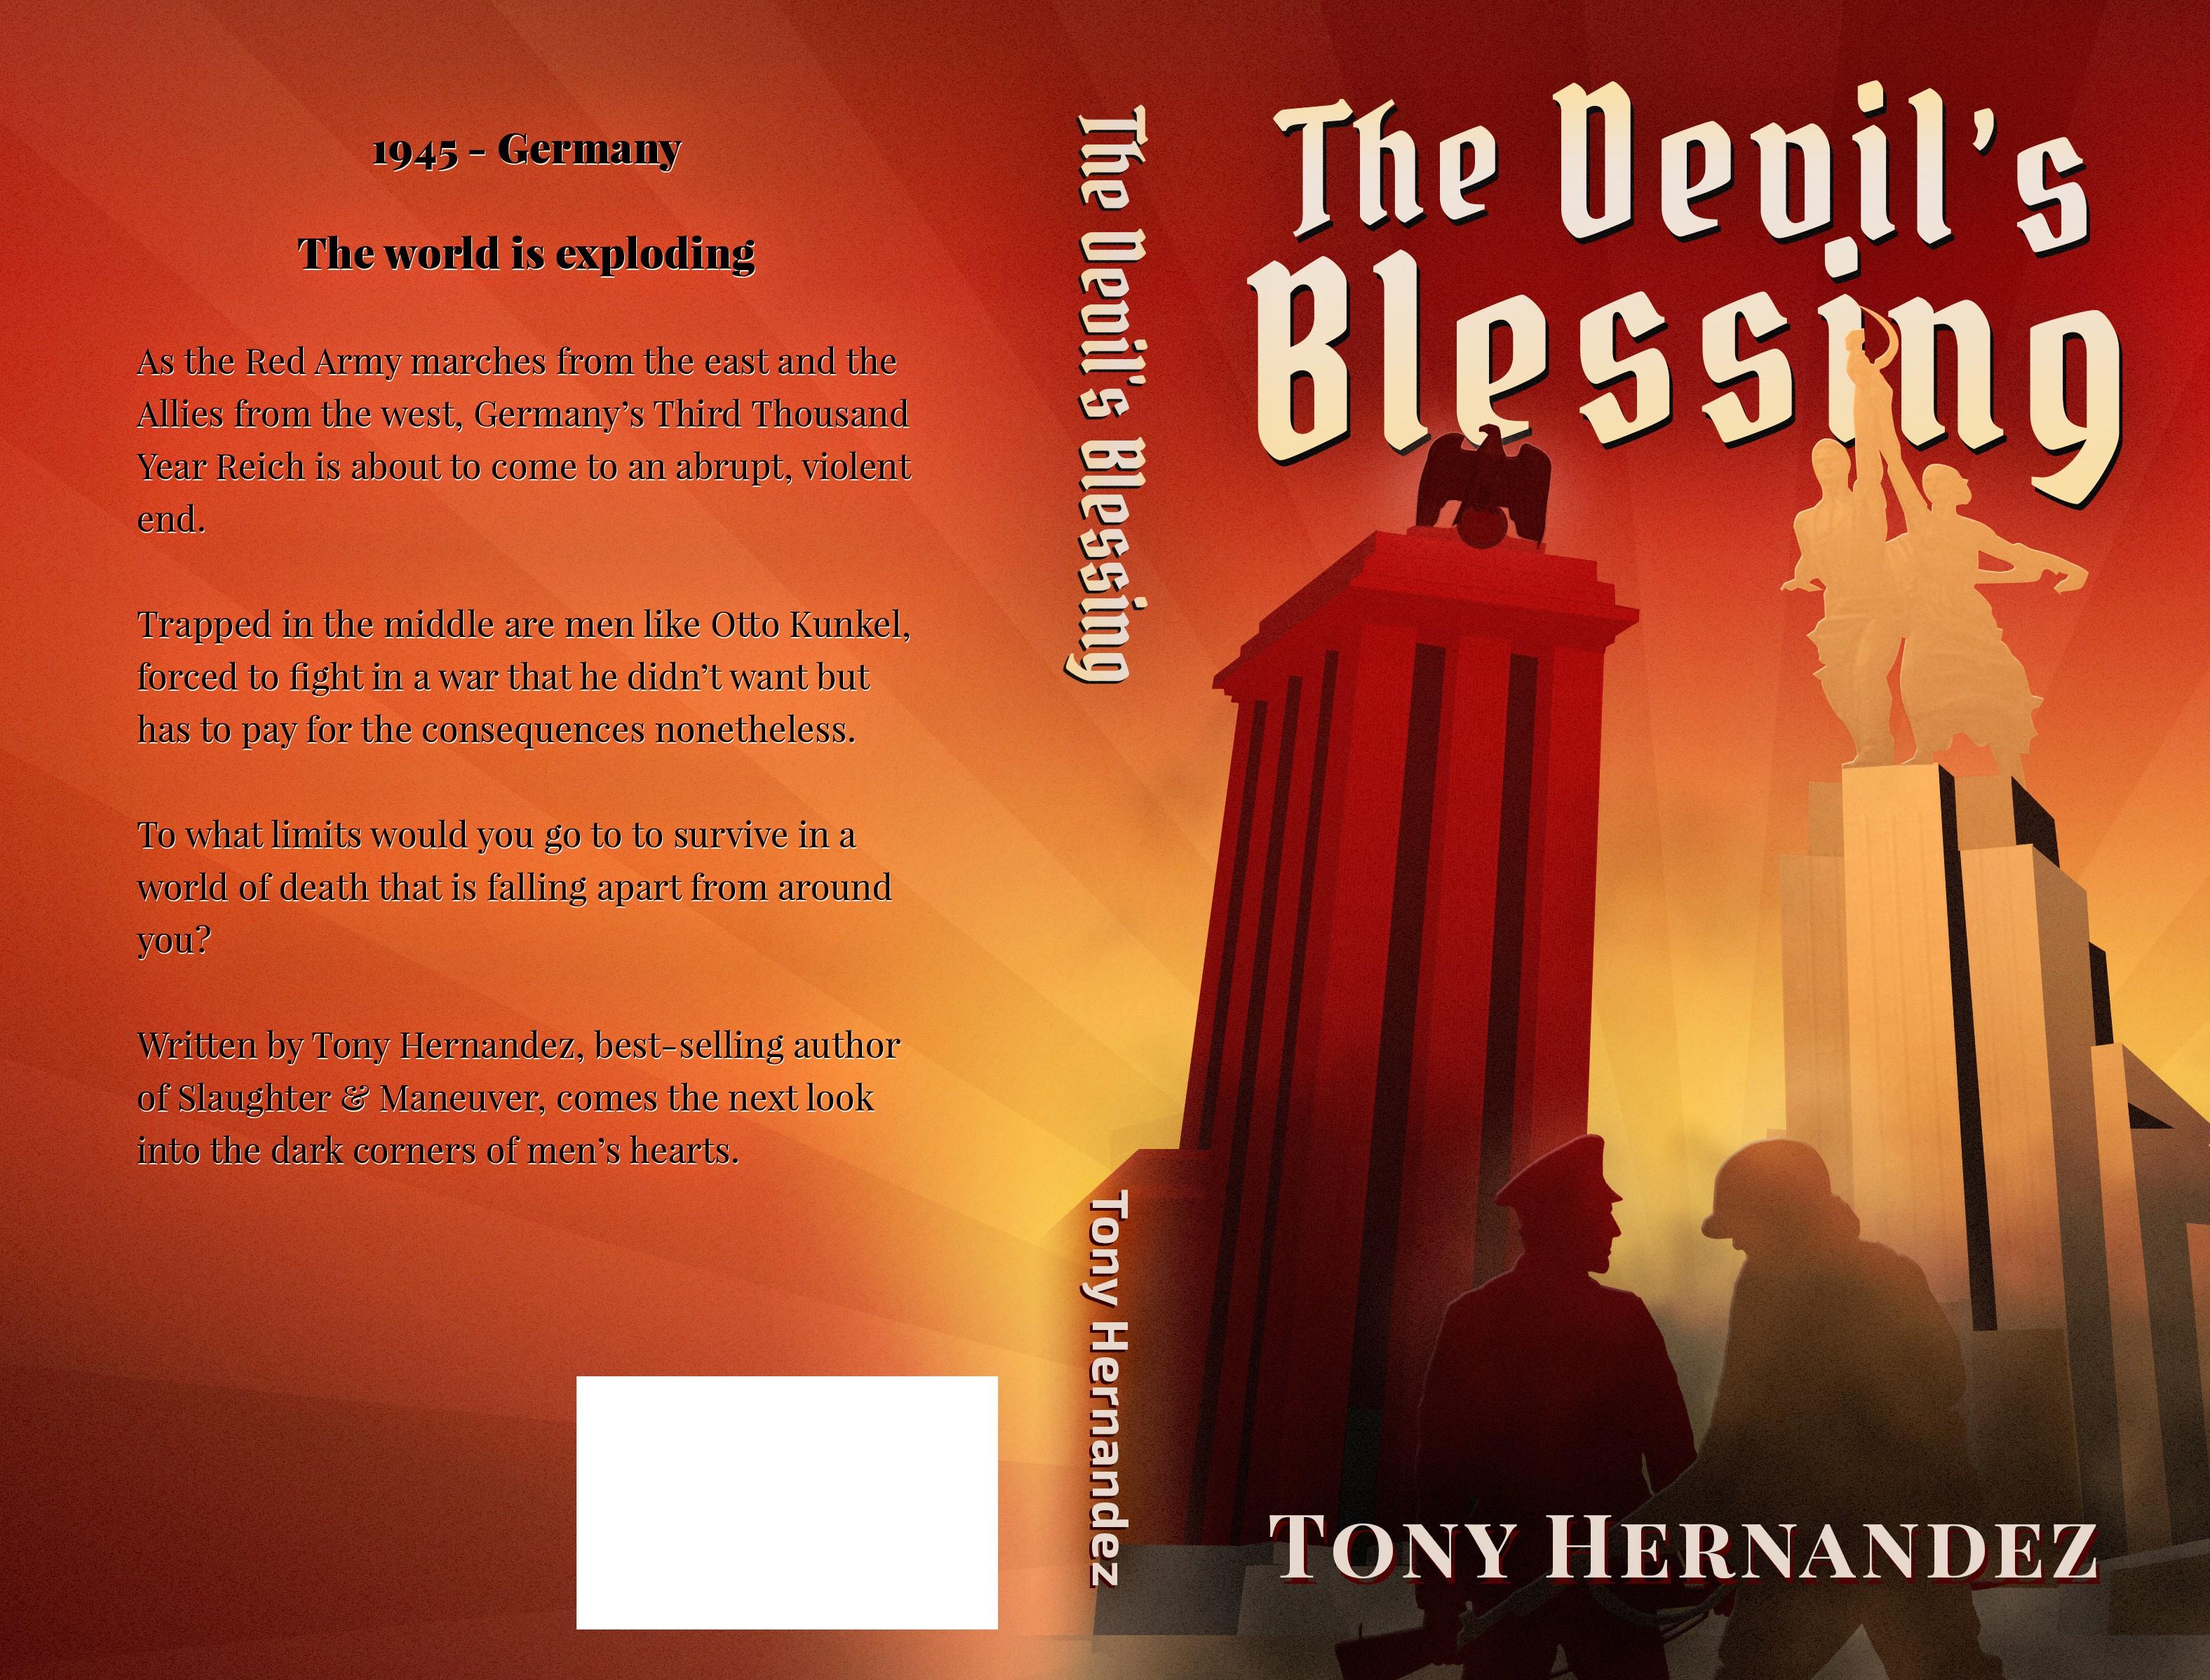 World War II Art Deco Inspired Book Cover!